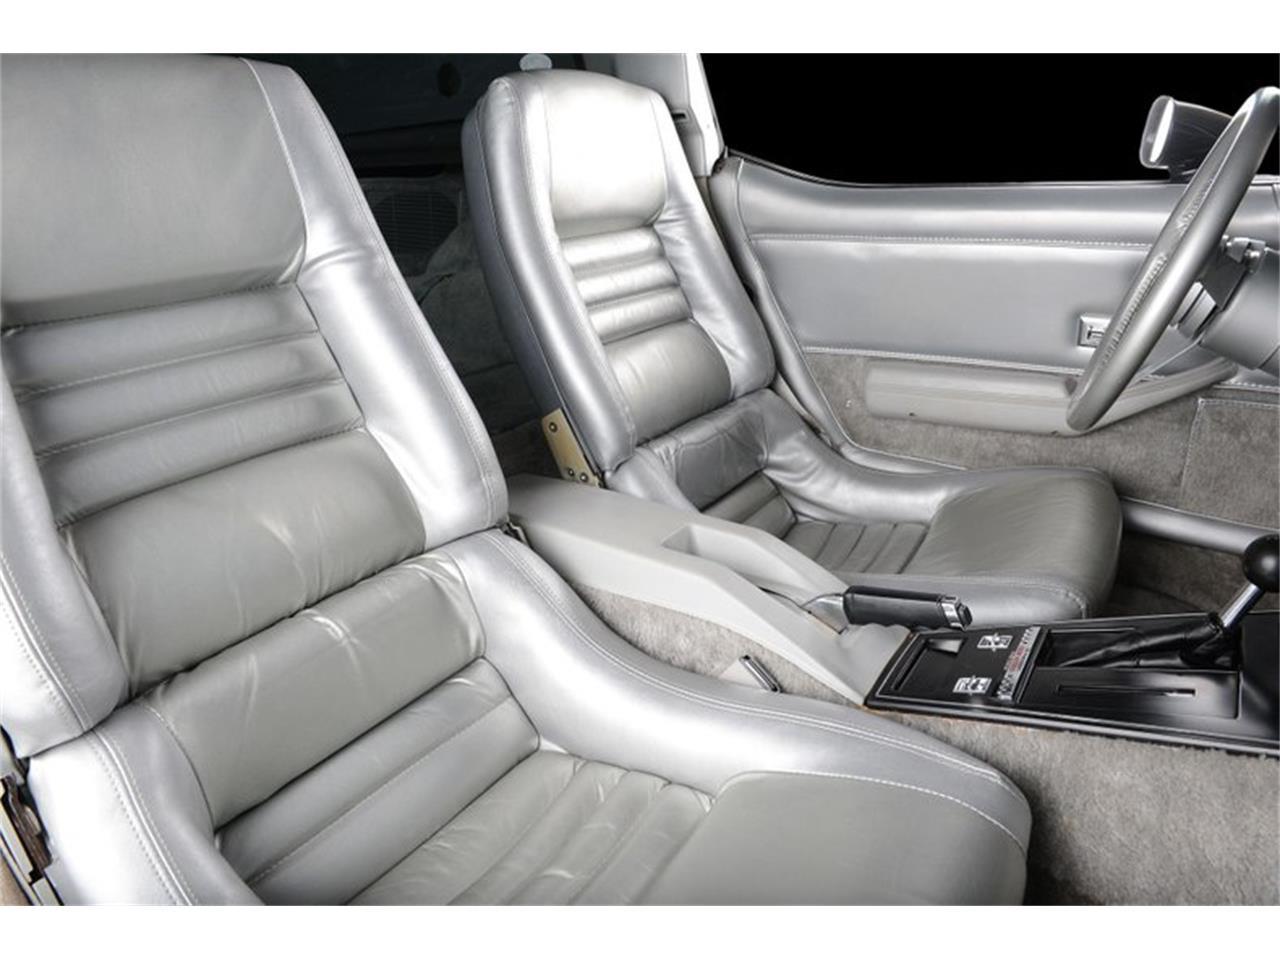 1978 Chevrolet Corvette (CC-1362732) for sale in West Chester, Pennsylvania